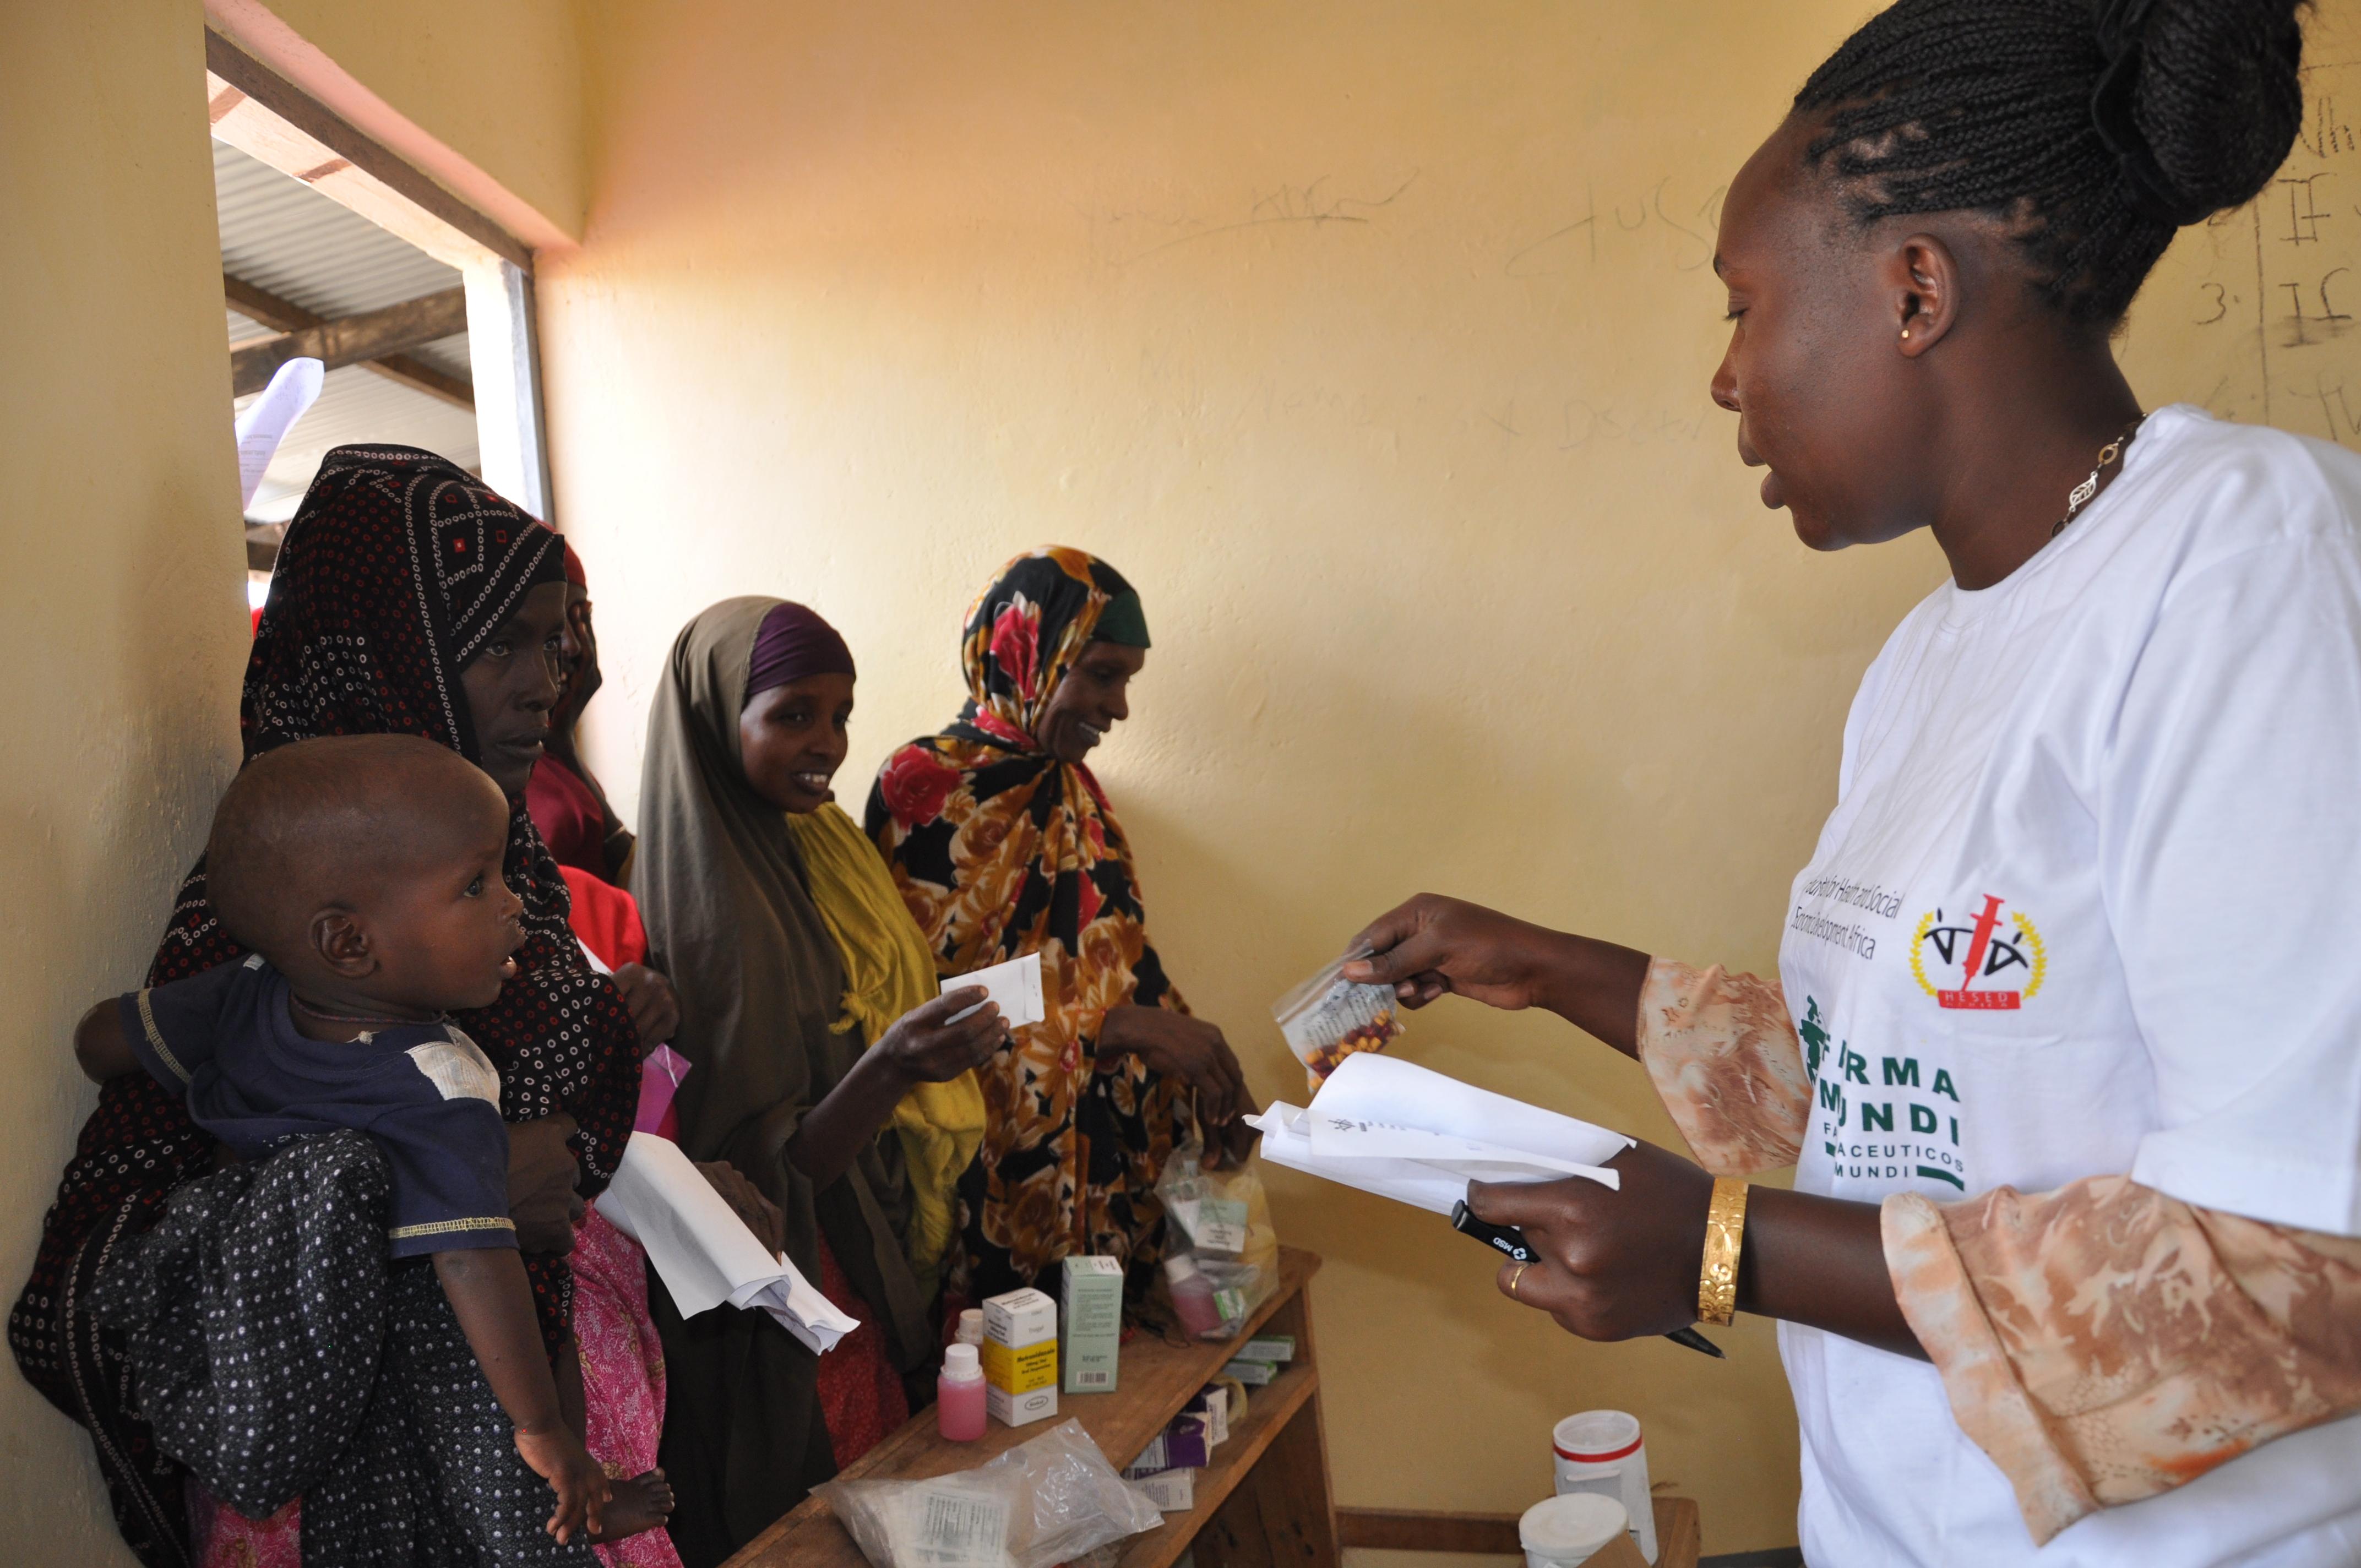 Atención-sanitaria-en-Dadaab-Kenia-farmamundi